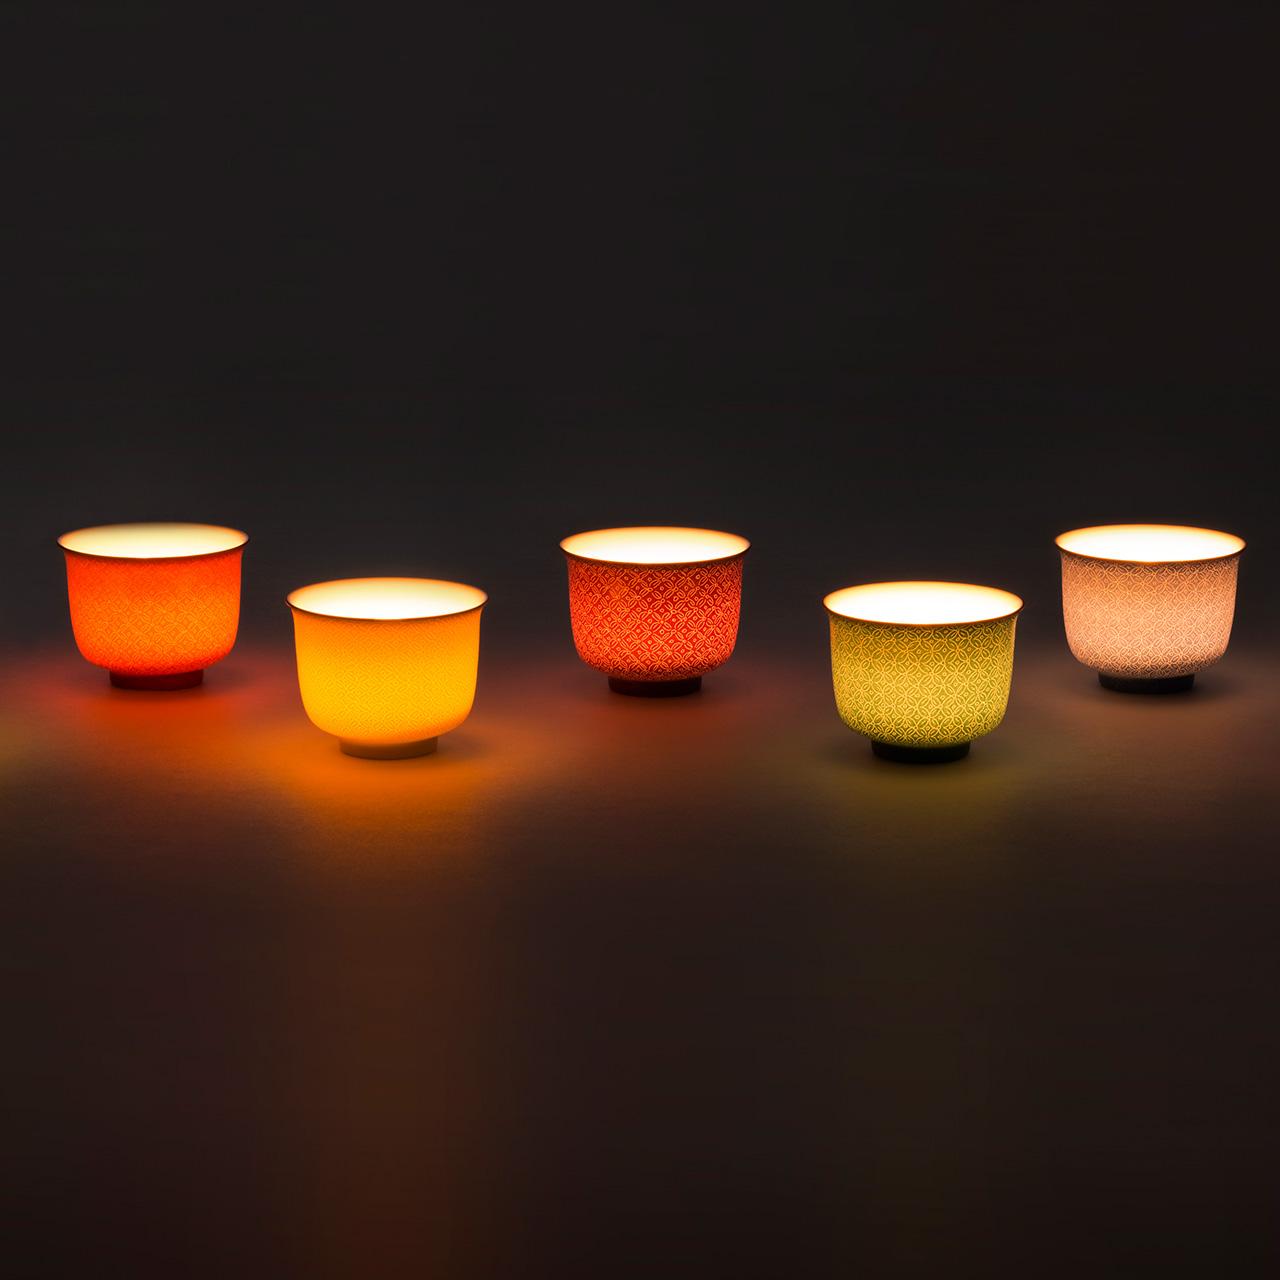 SHANGXIA 烛台底座简约 锦上添花系列瓷器烛台 上下